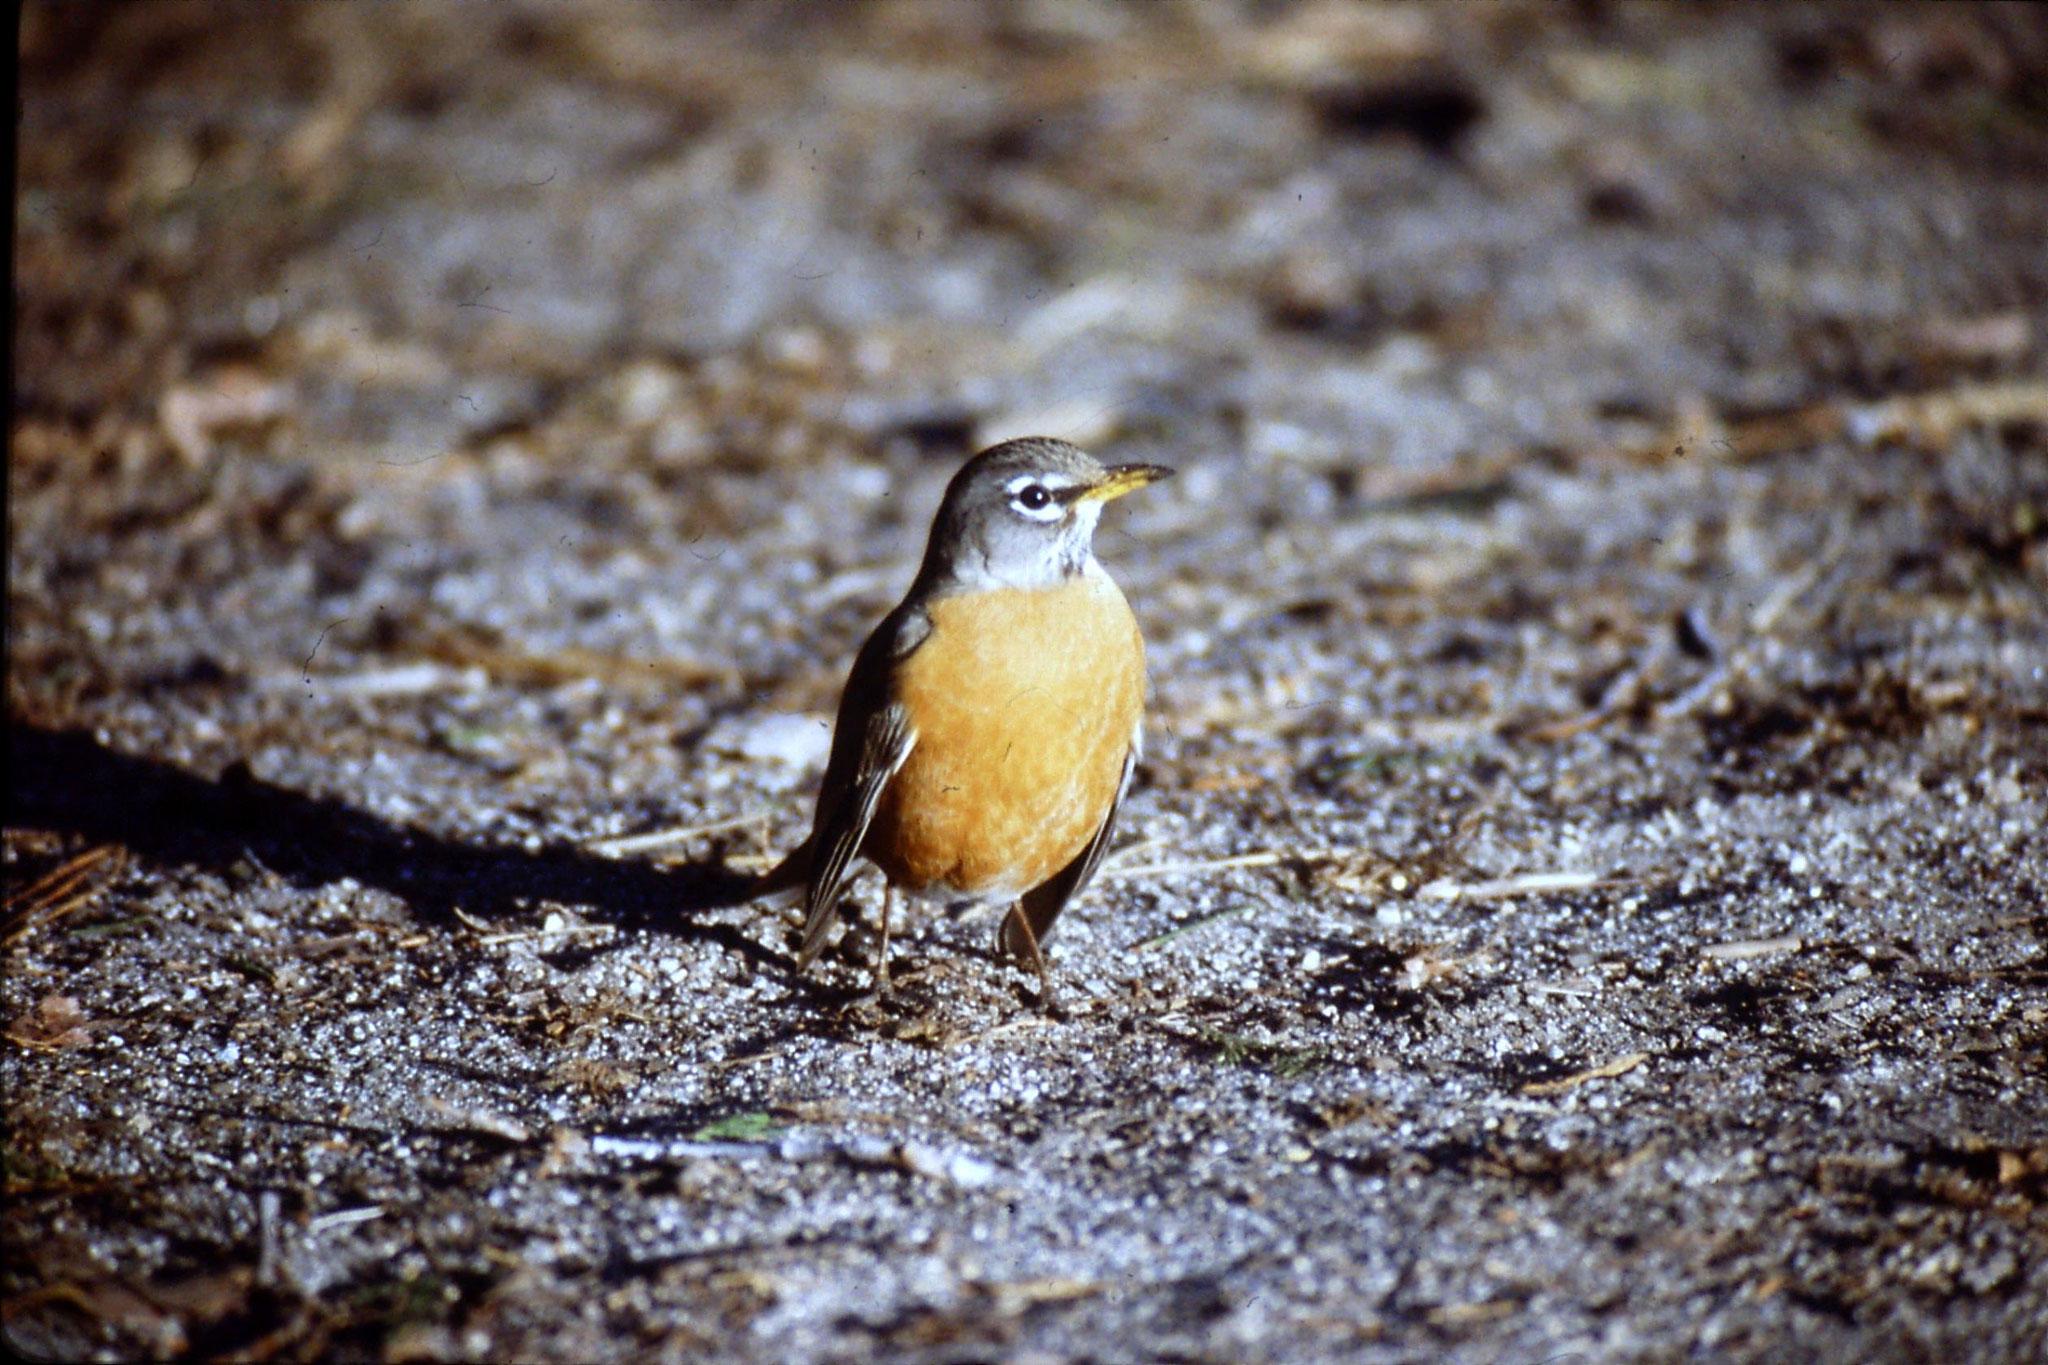 16/2/1991: 27: Yosemite, American Robin